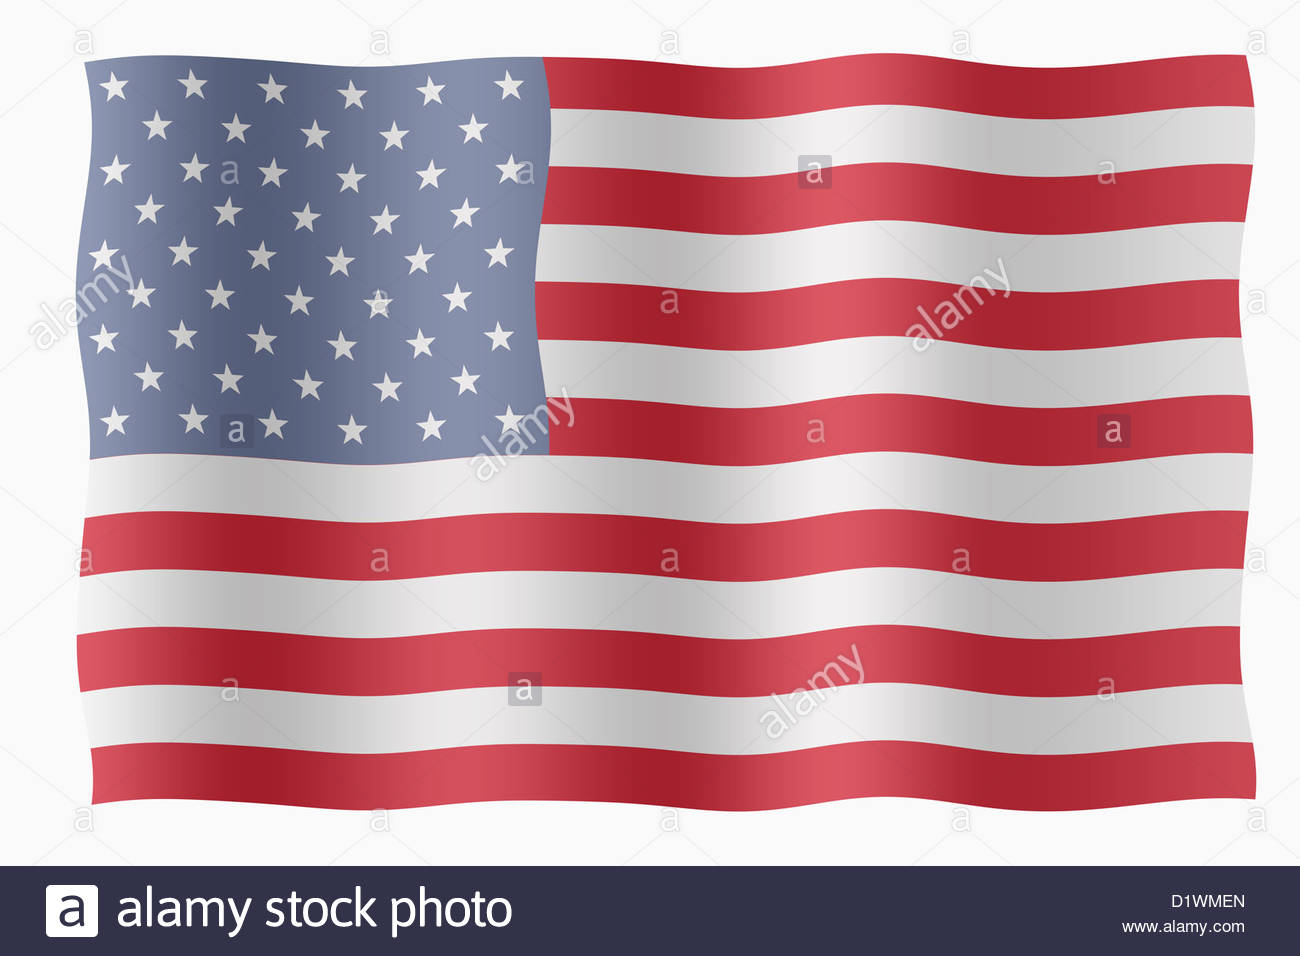 Digital Illustration - Stars and Stripes flag - Stock Image